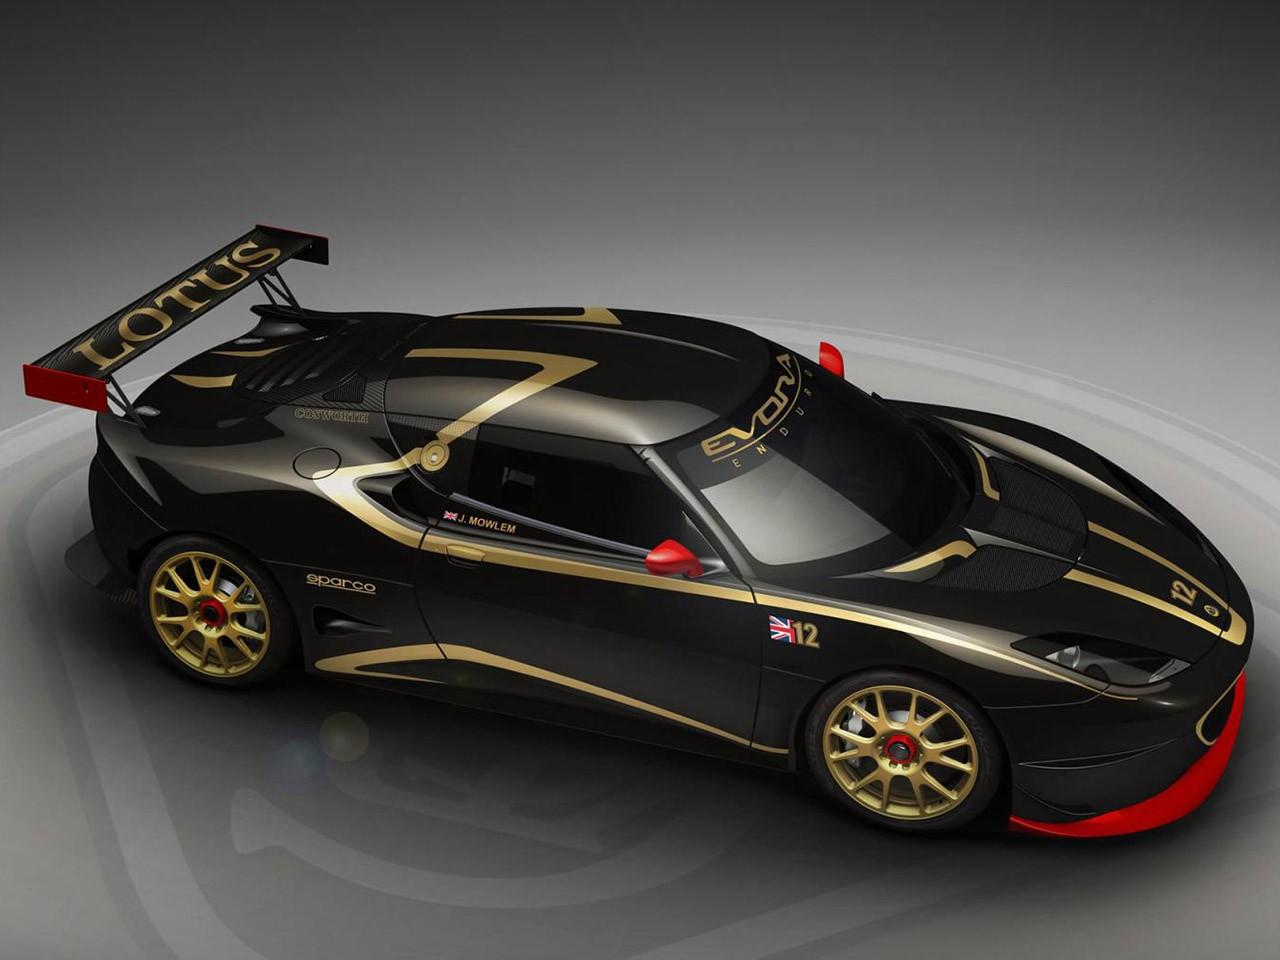 2011 Lotus Evora Enduro GT Concept